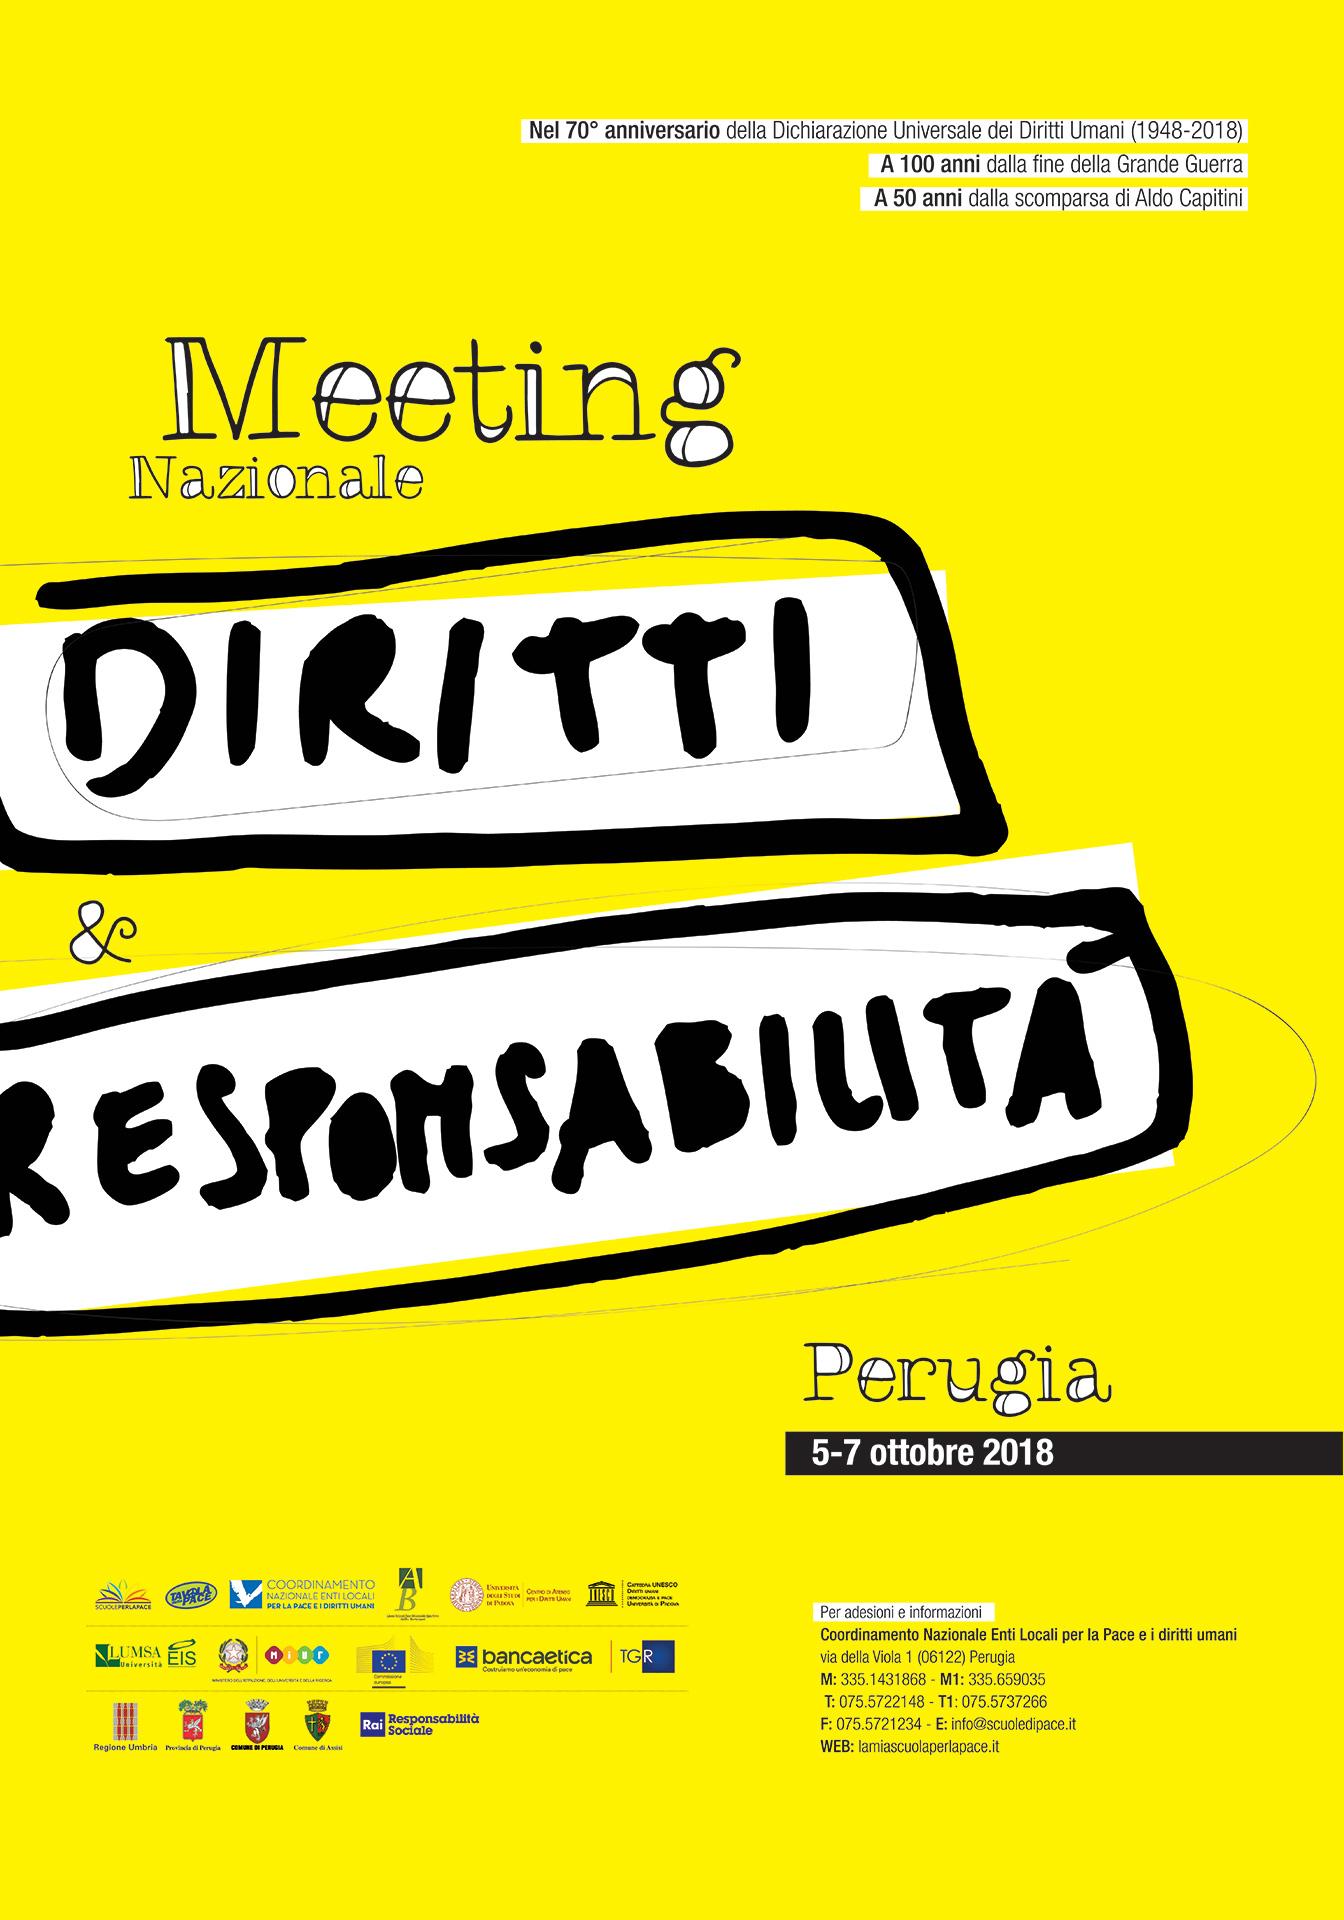 "Meeting nazionale ""Diritti e Responsabilità"", Marcia #PerugiAssisi, 5-7 ottobre 2018"